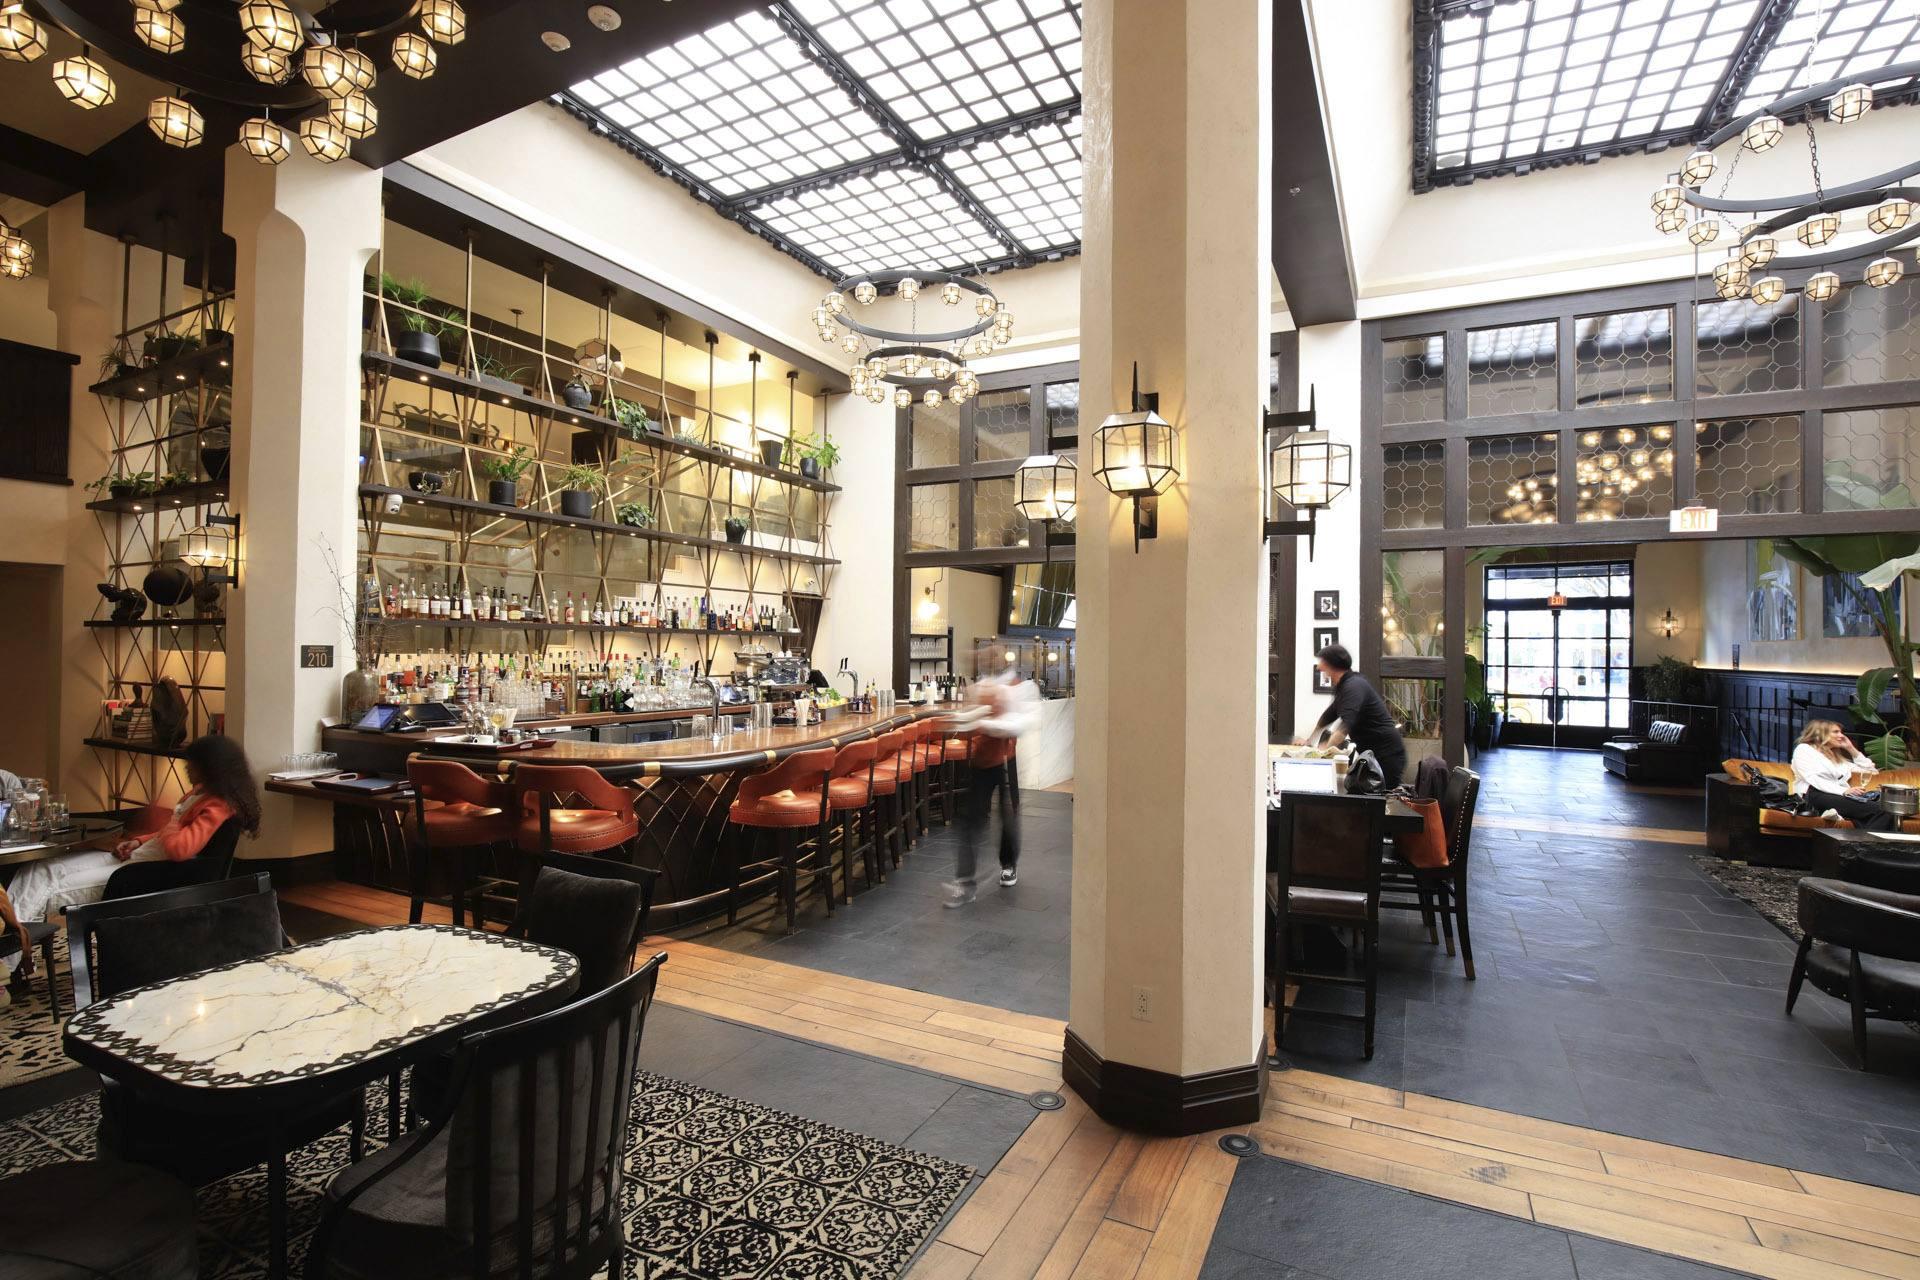 ' Hotel Figueroa Discover Los Angeles